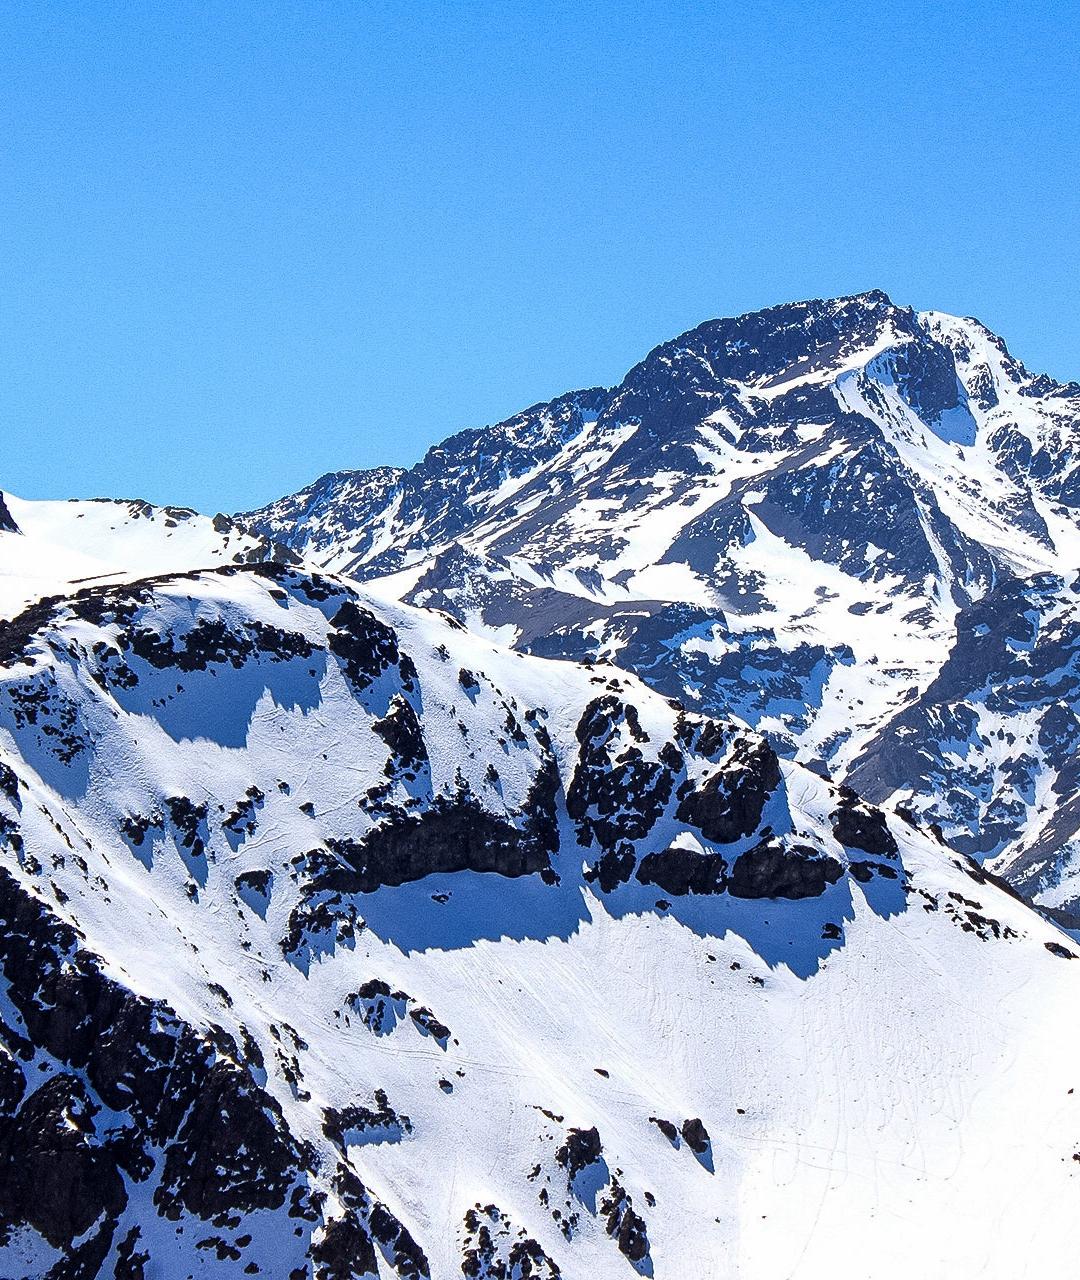 Snowcap Mountains iPhone Wallpaper